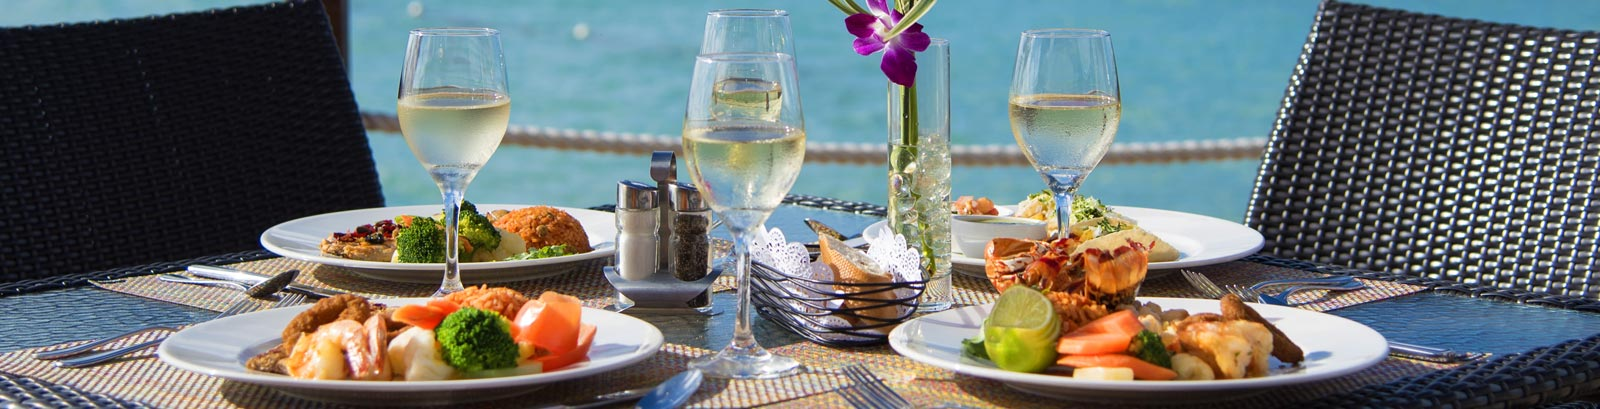 Restaurant Emilio Sint Maarten - Nos recommandations au Simpson Bay Resort & Marina